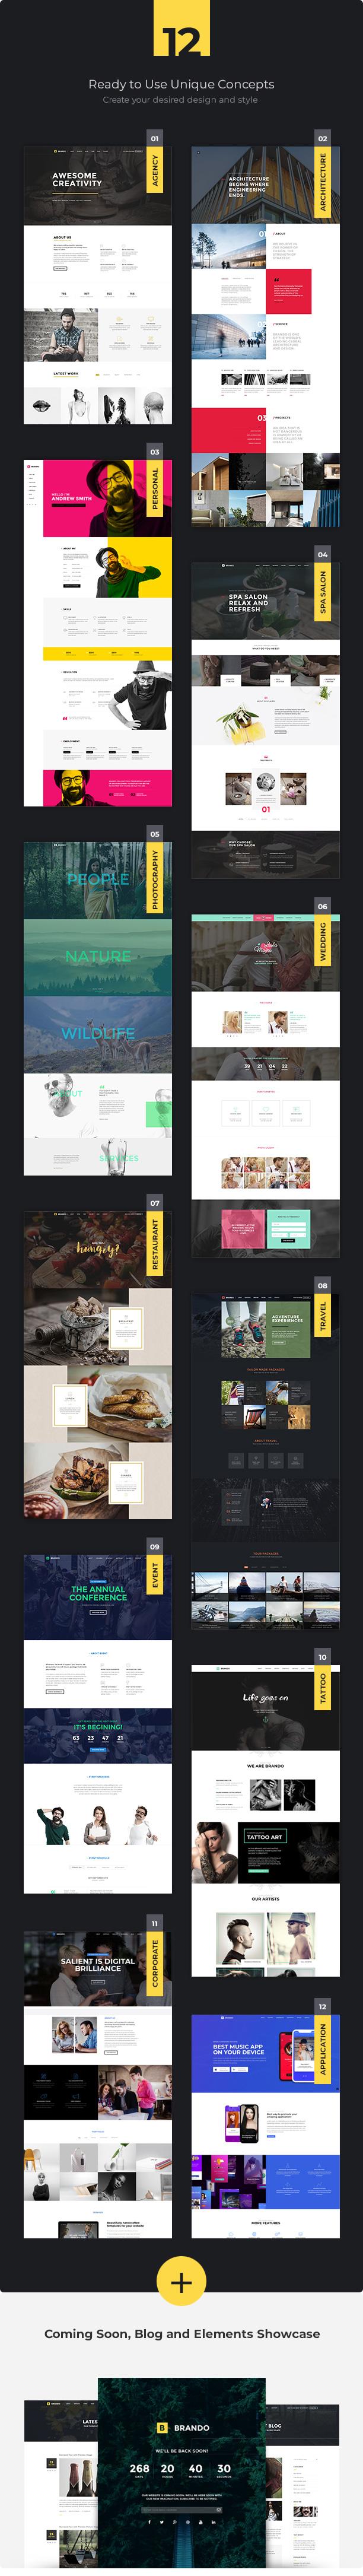 brando wp unique concepts demo v7 v2 - Brando Responsive and Multipurpose OnePage WordPress Theme